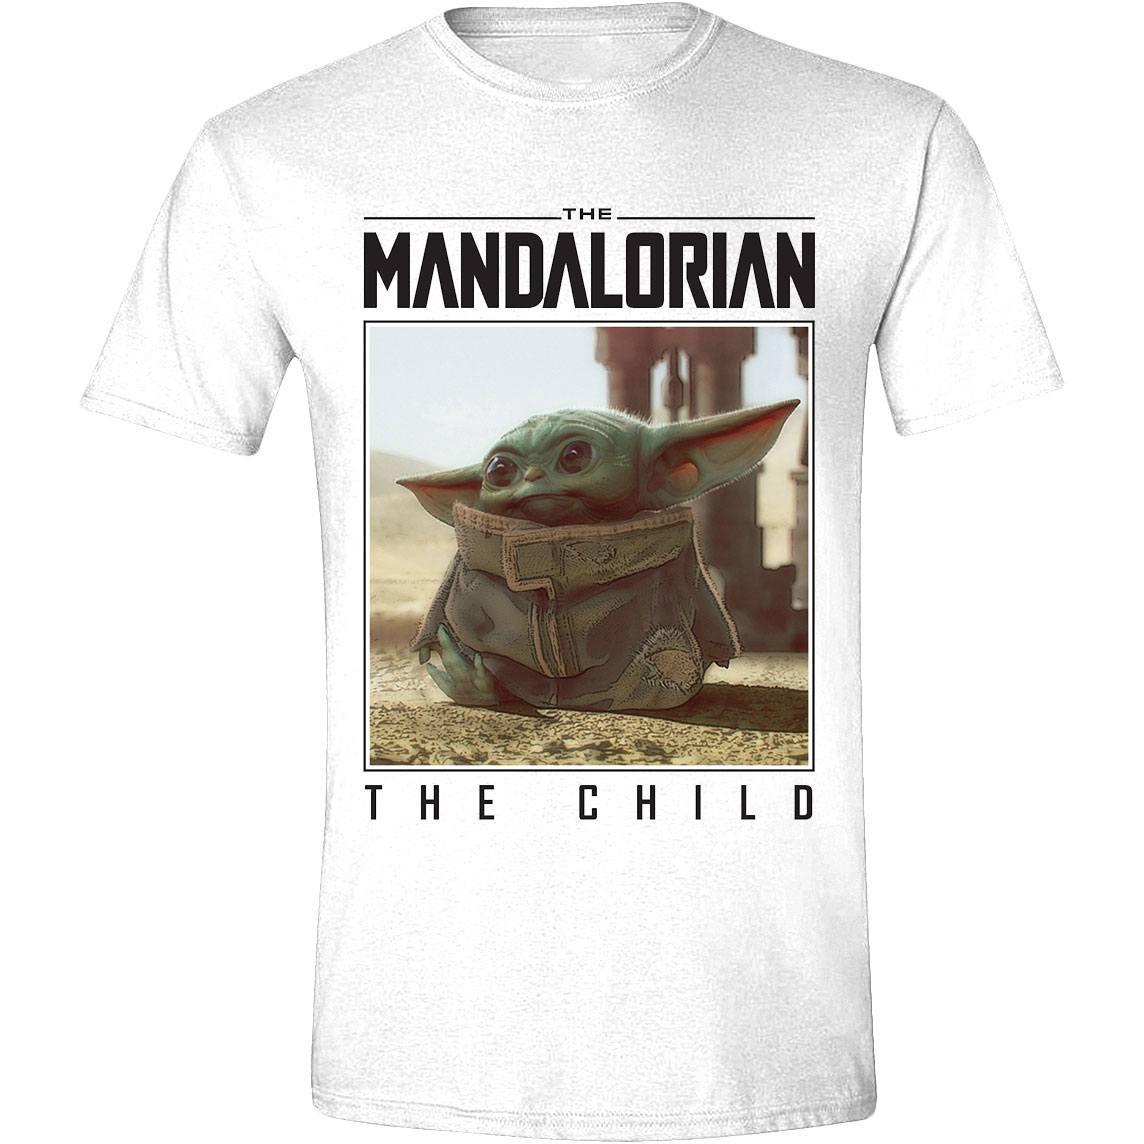 Star Wars The Mandalorian T-Shirt The Child Photo